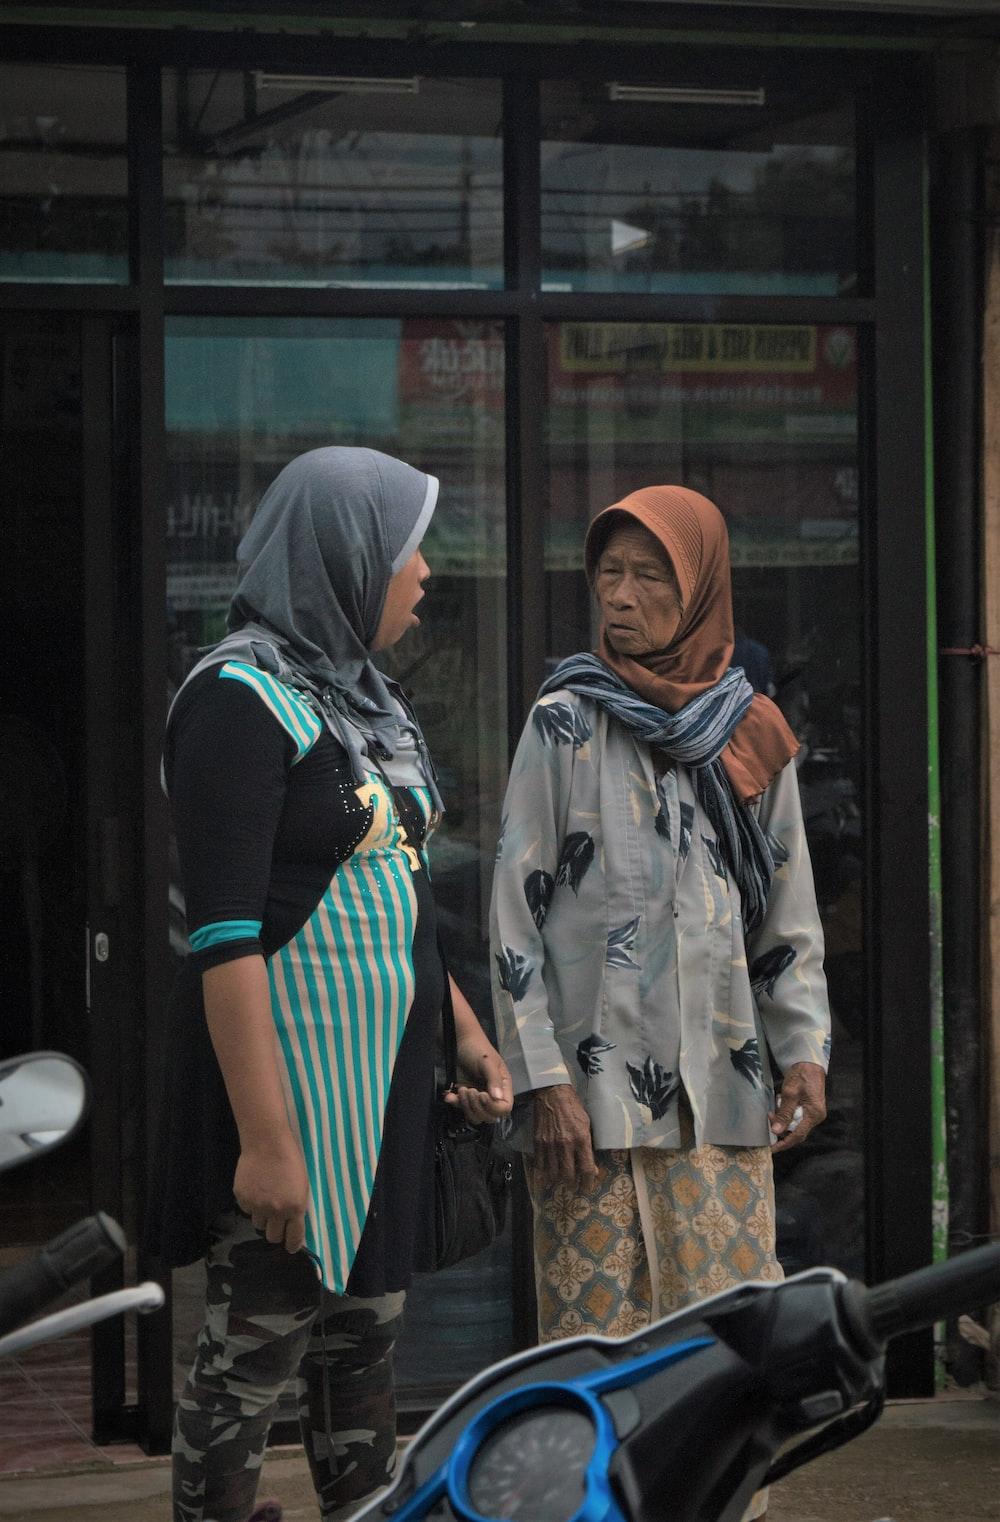 two person having conversation near glass door